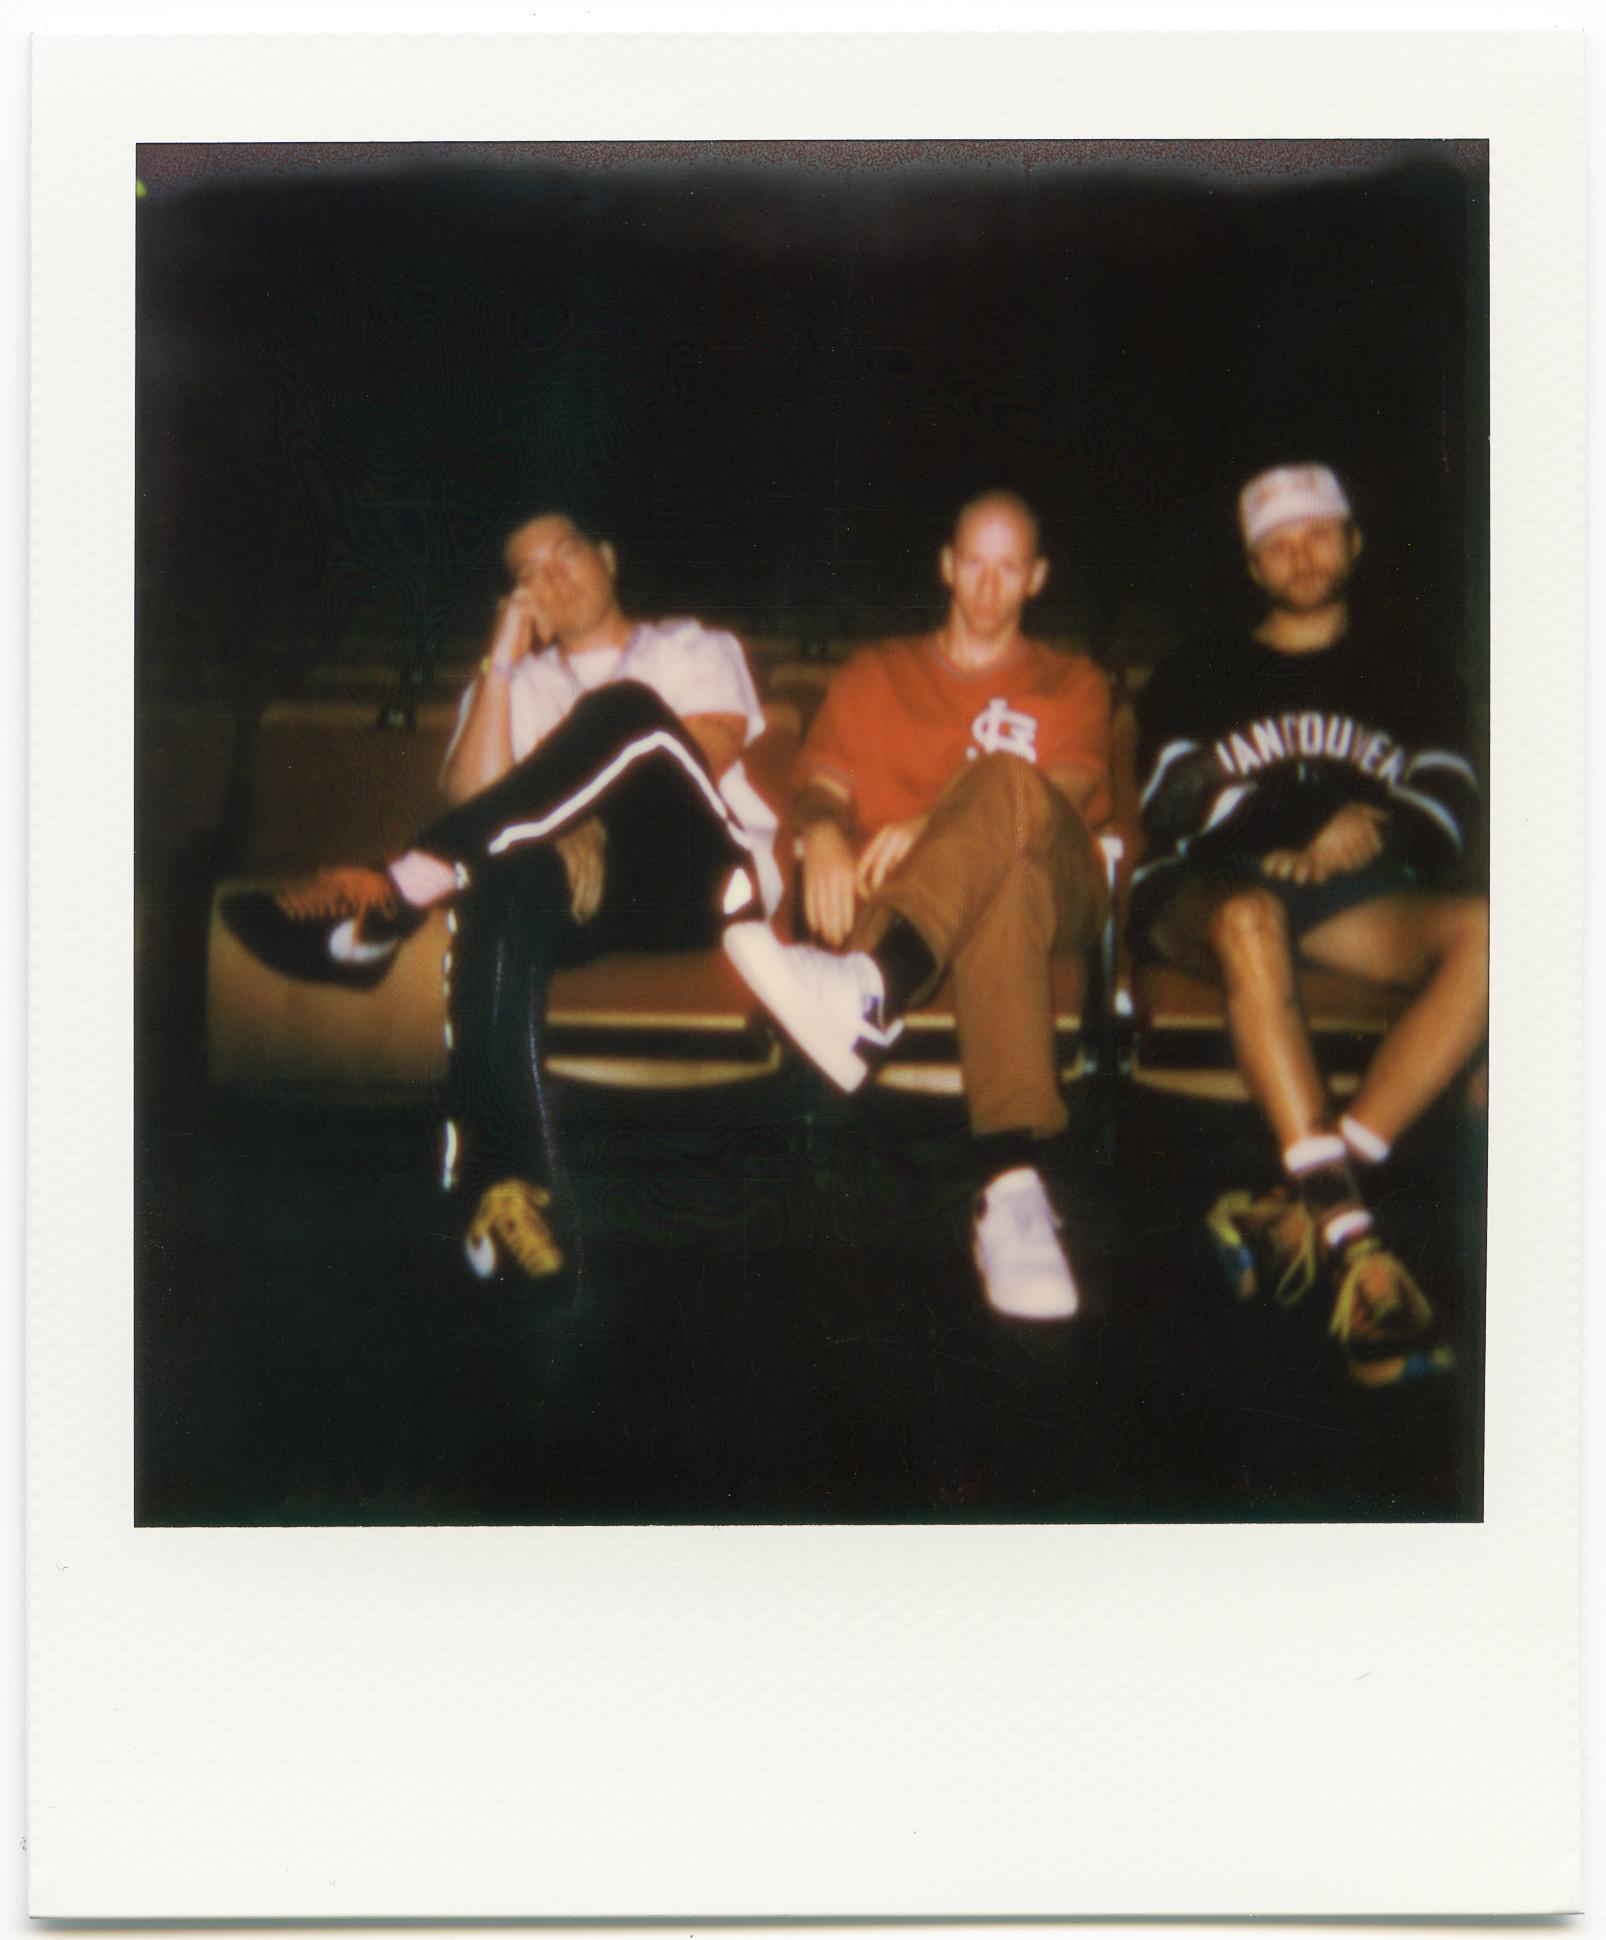 LANY-Polaroid-17-06-2019-Vancouver-6.jpg